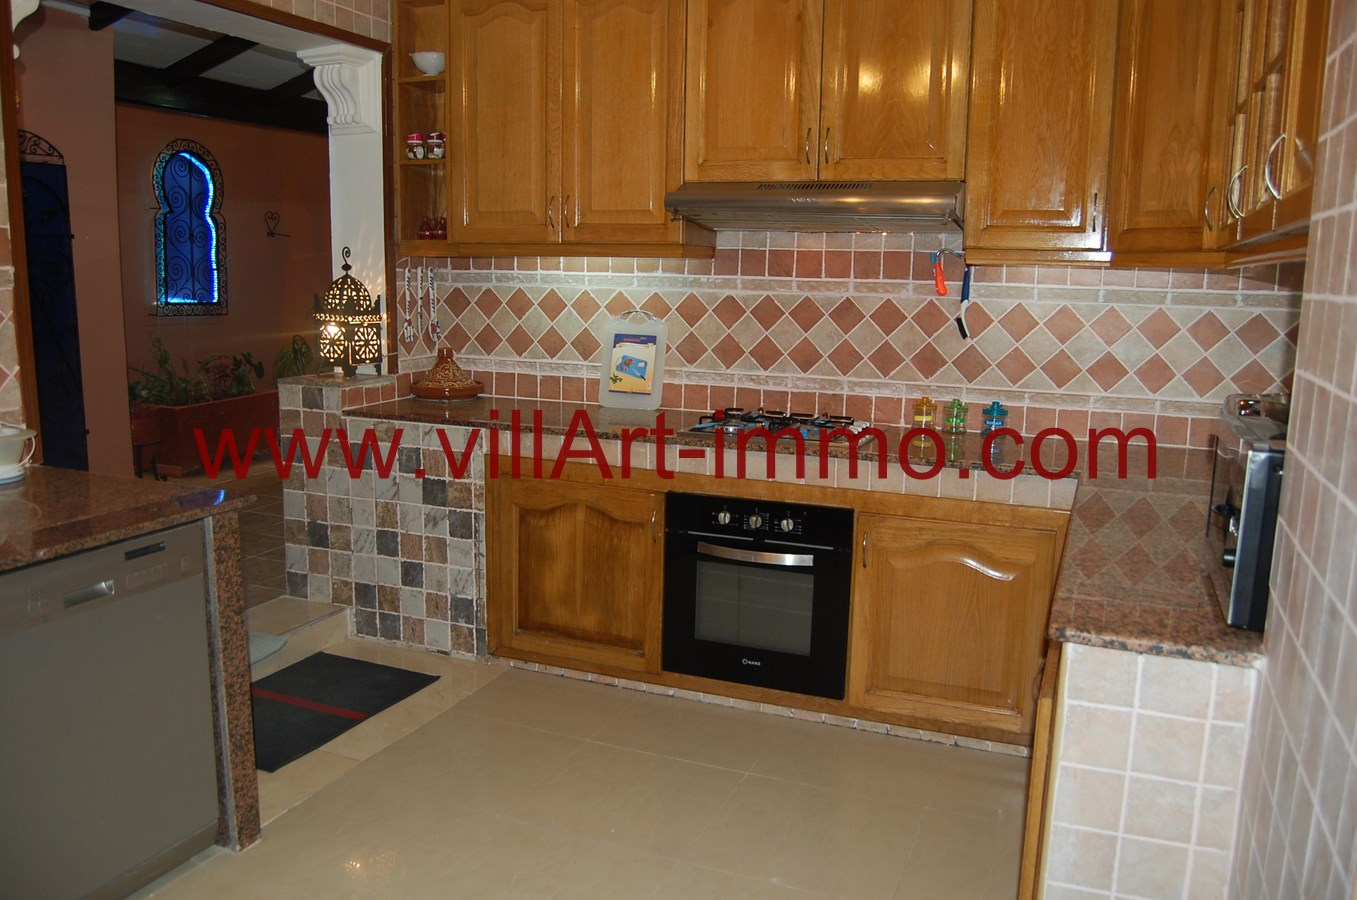 bel appartement a louer de type f4 meubl tanger villart. Black Bedroom Furniture Sets. Home Design Ideas